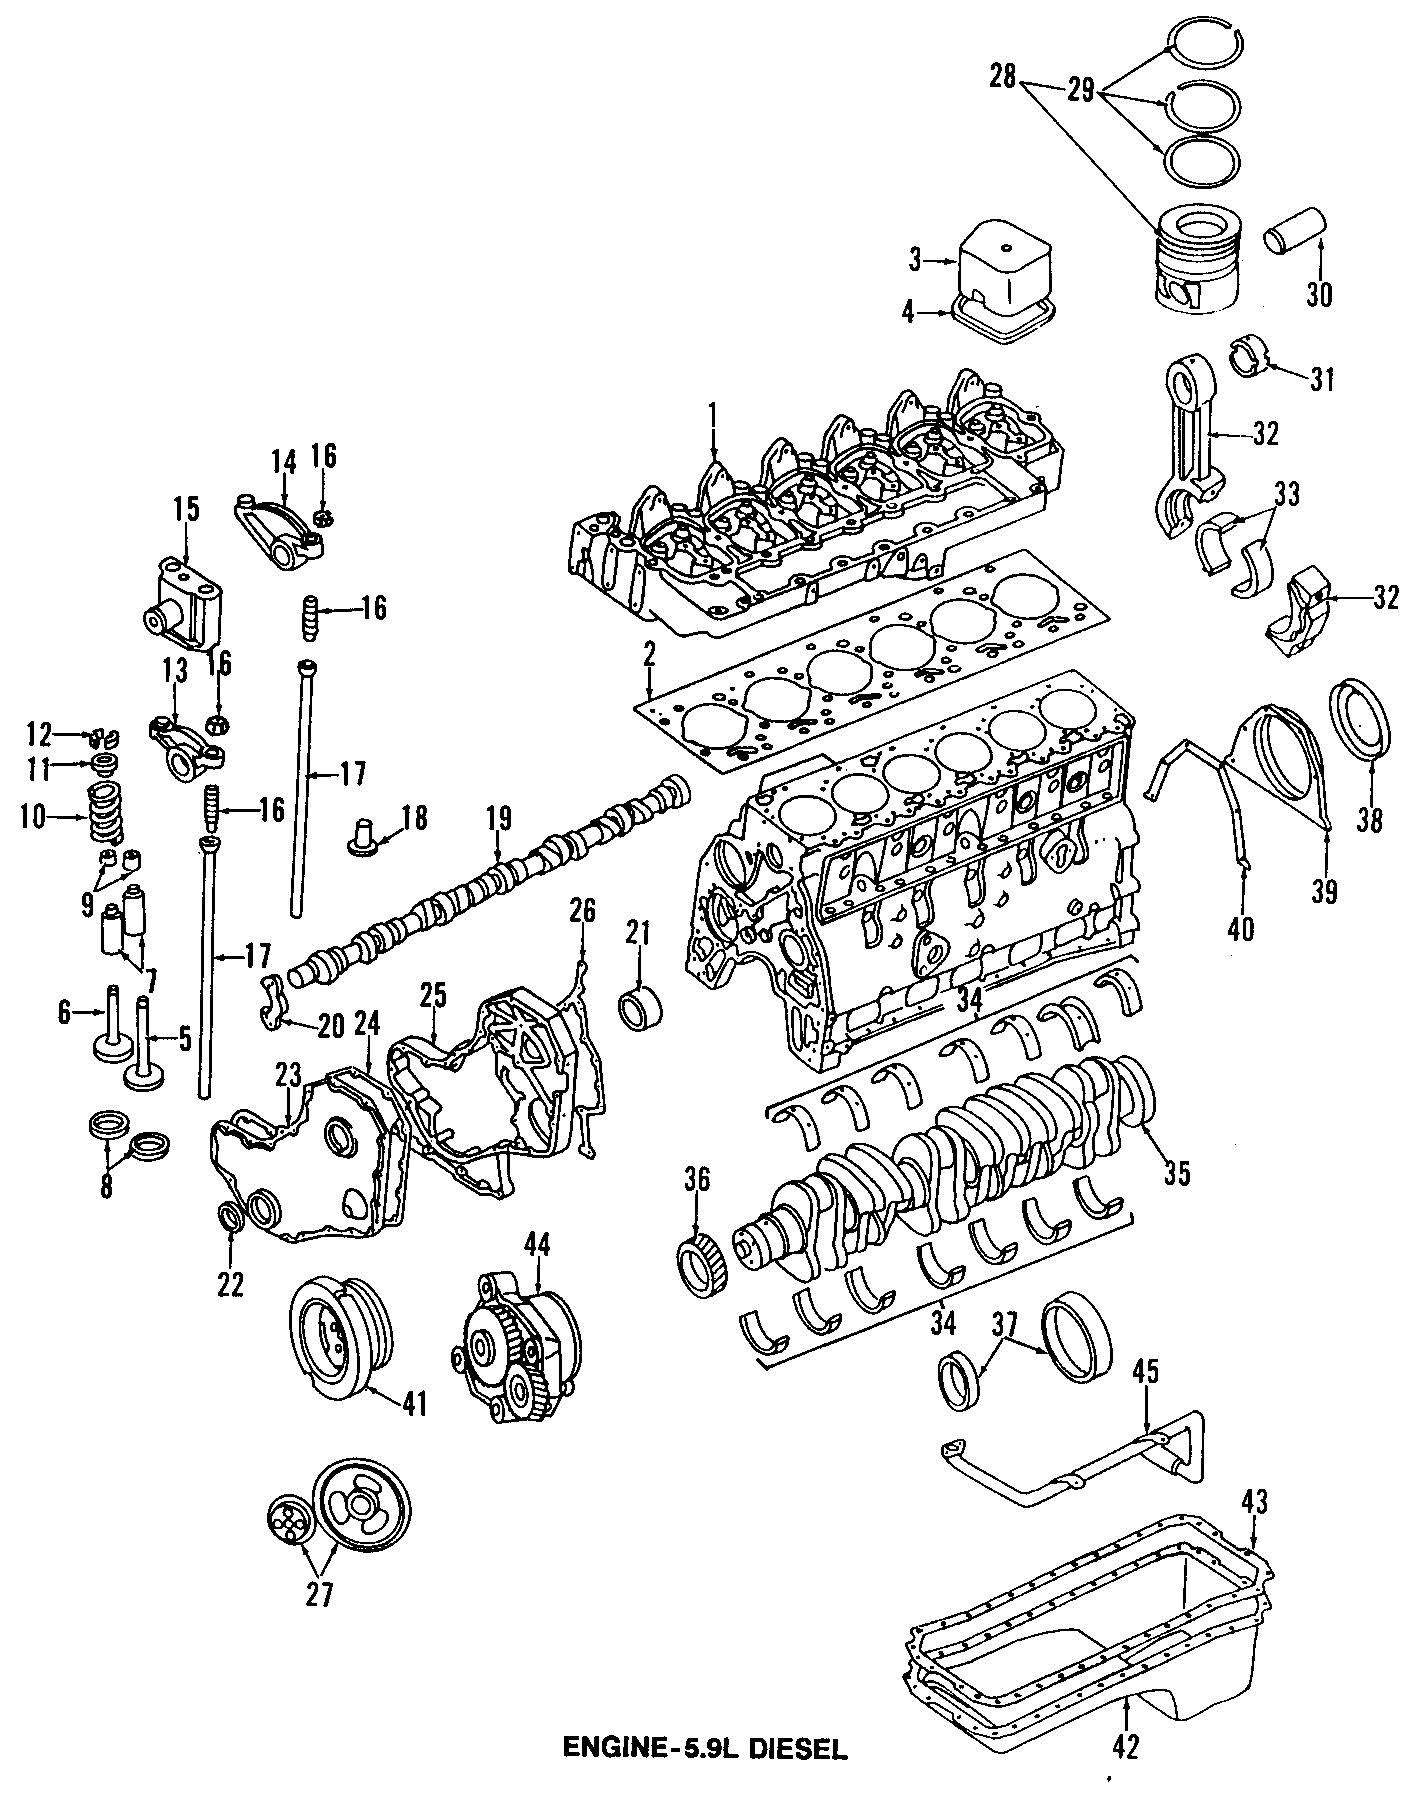 Dodge Ram 3500 Engine Crankshaft Seal (Rear). Crankshaft